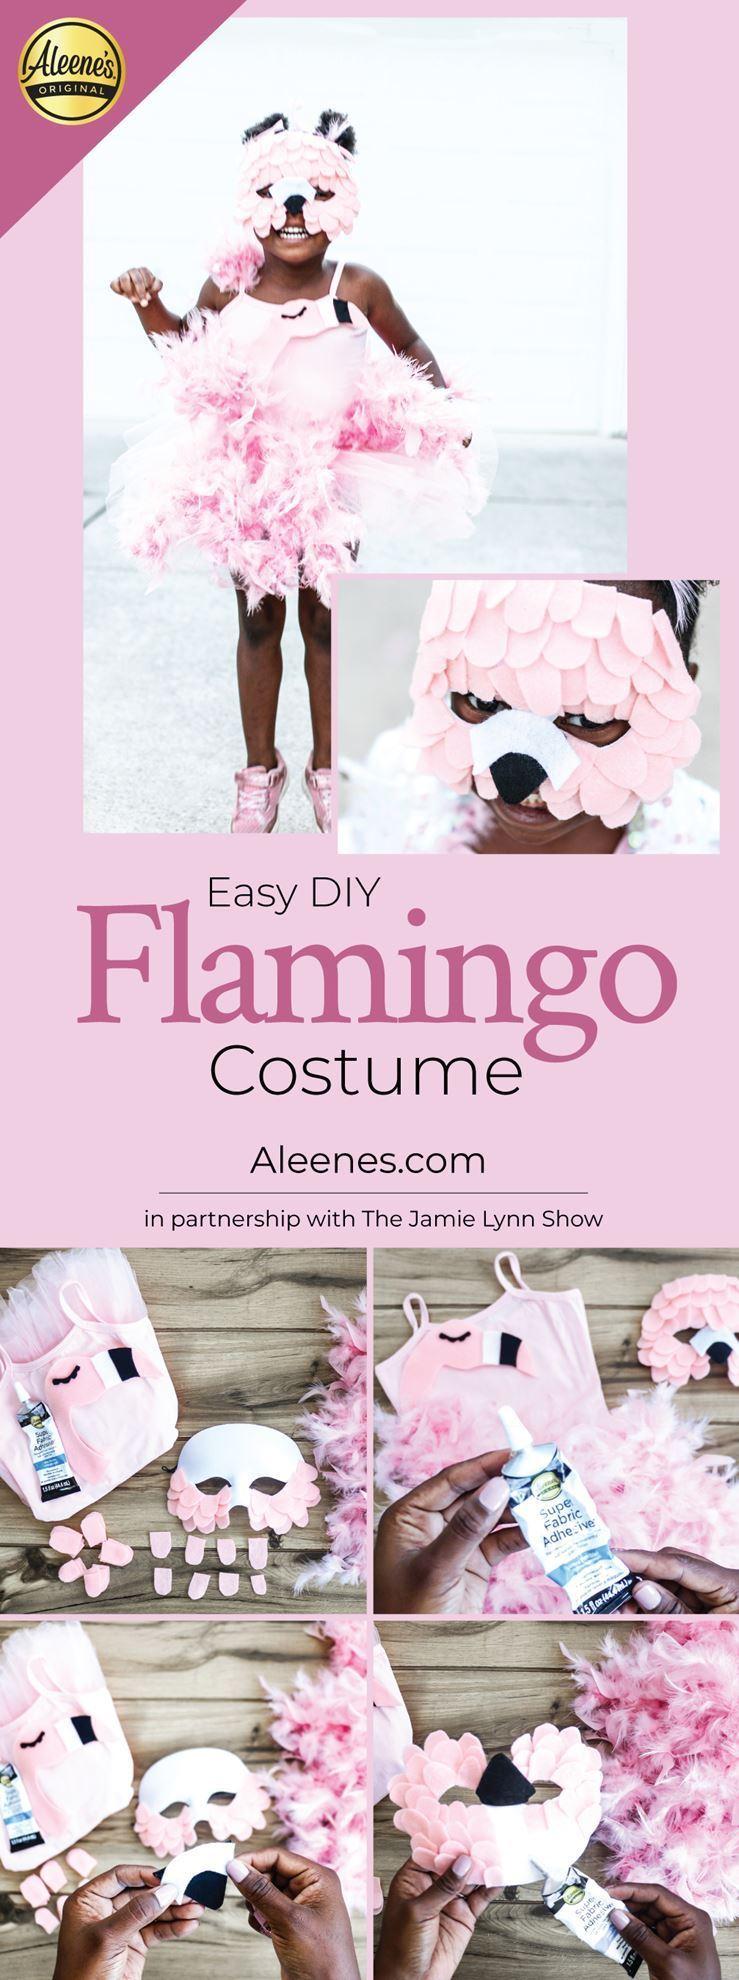 Flamingo Easy DIY Halloween Costume